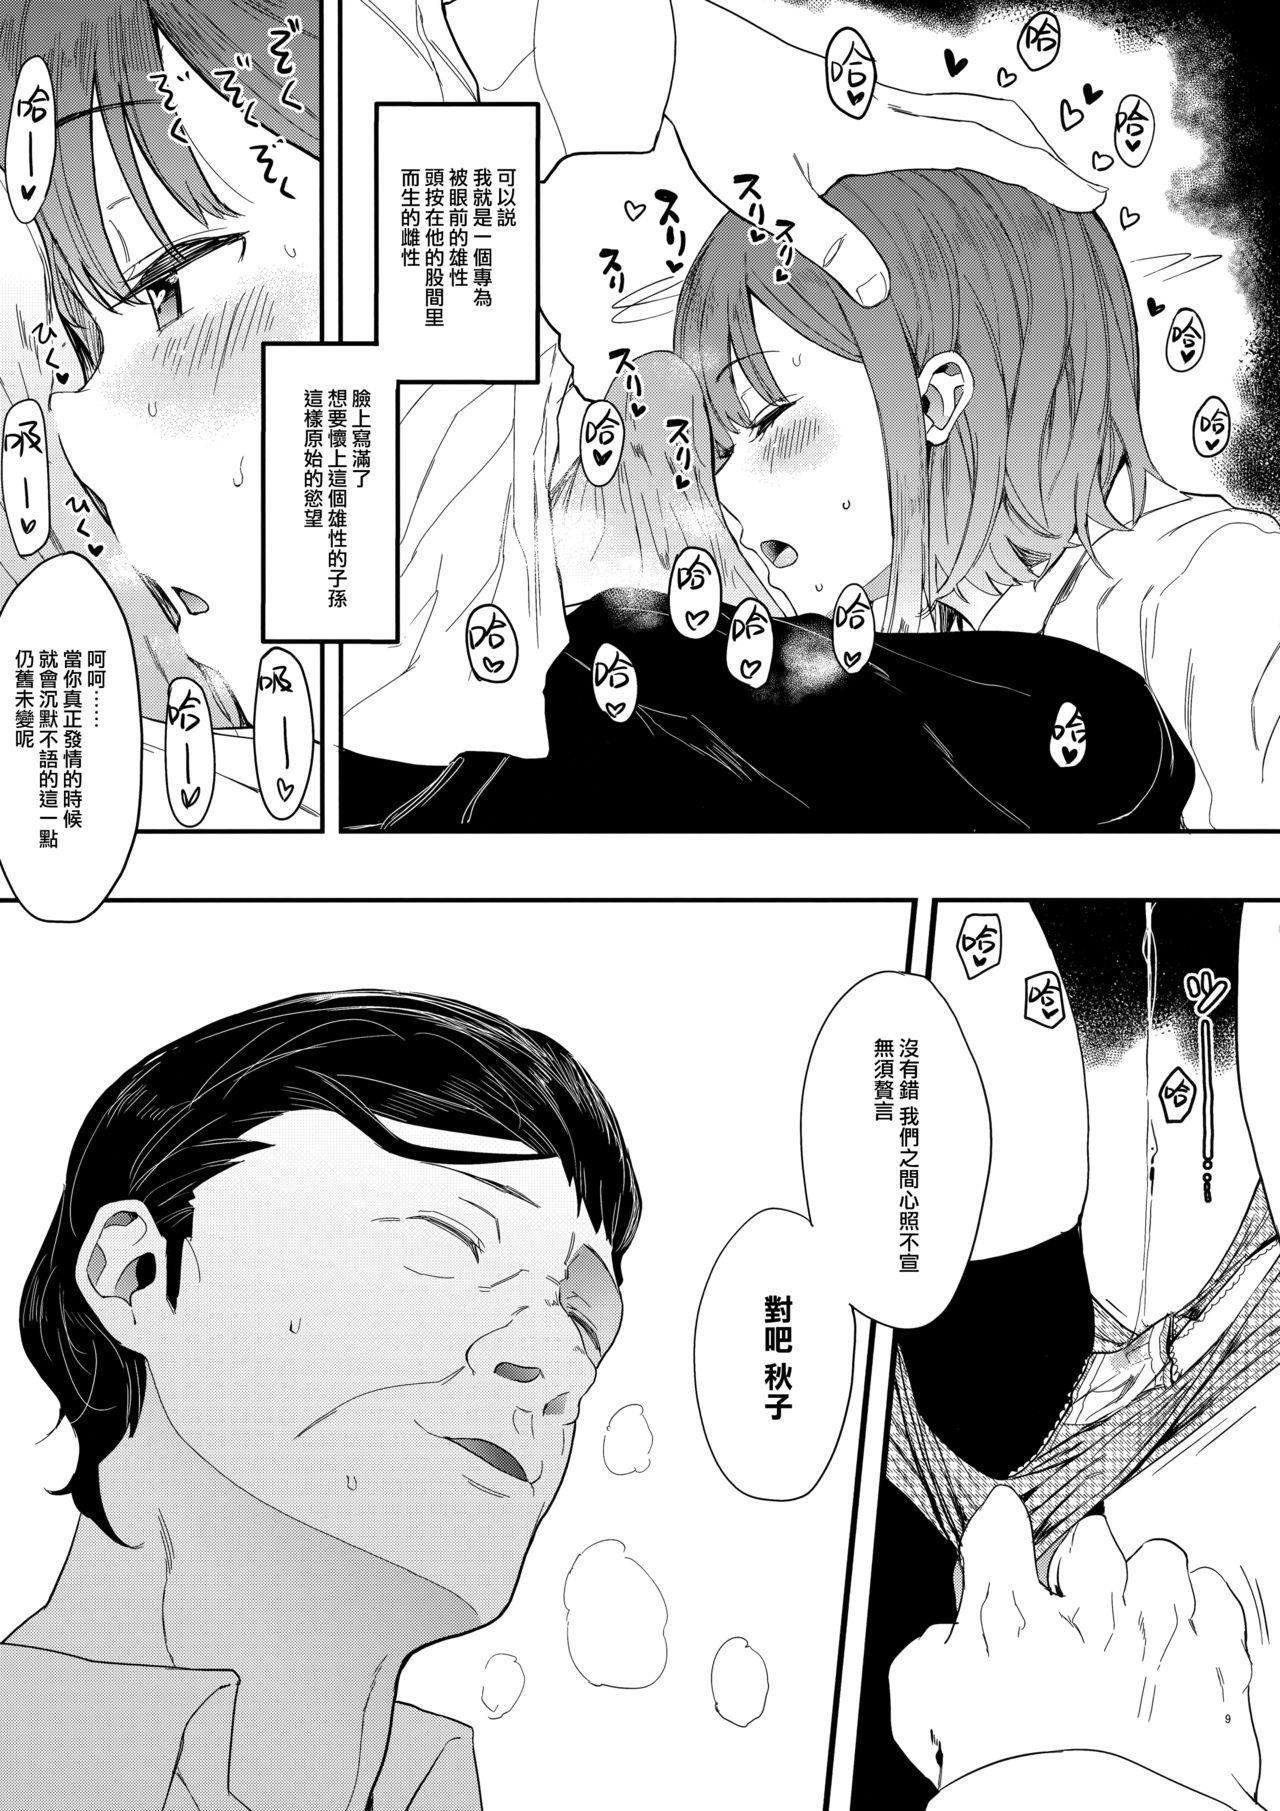 Yuzu-nee 10